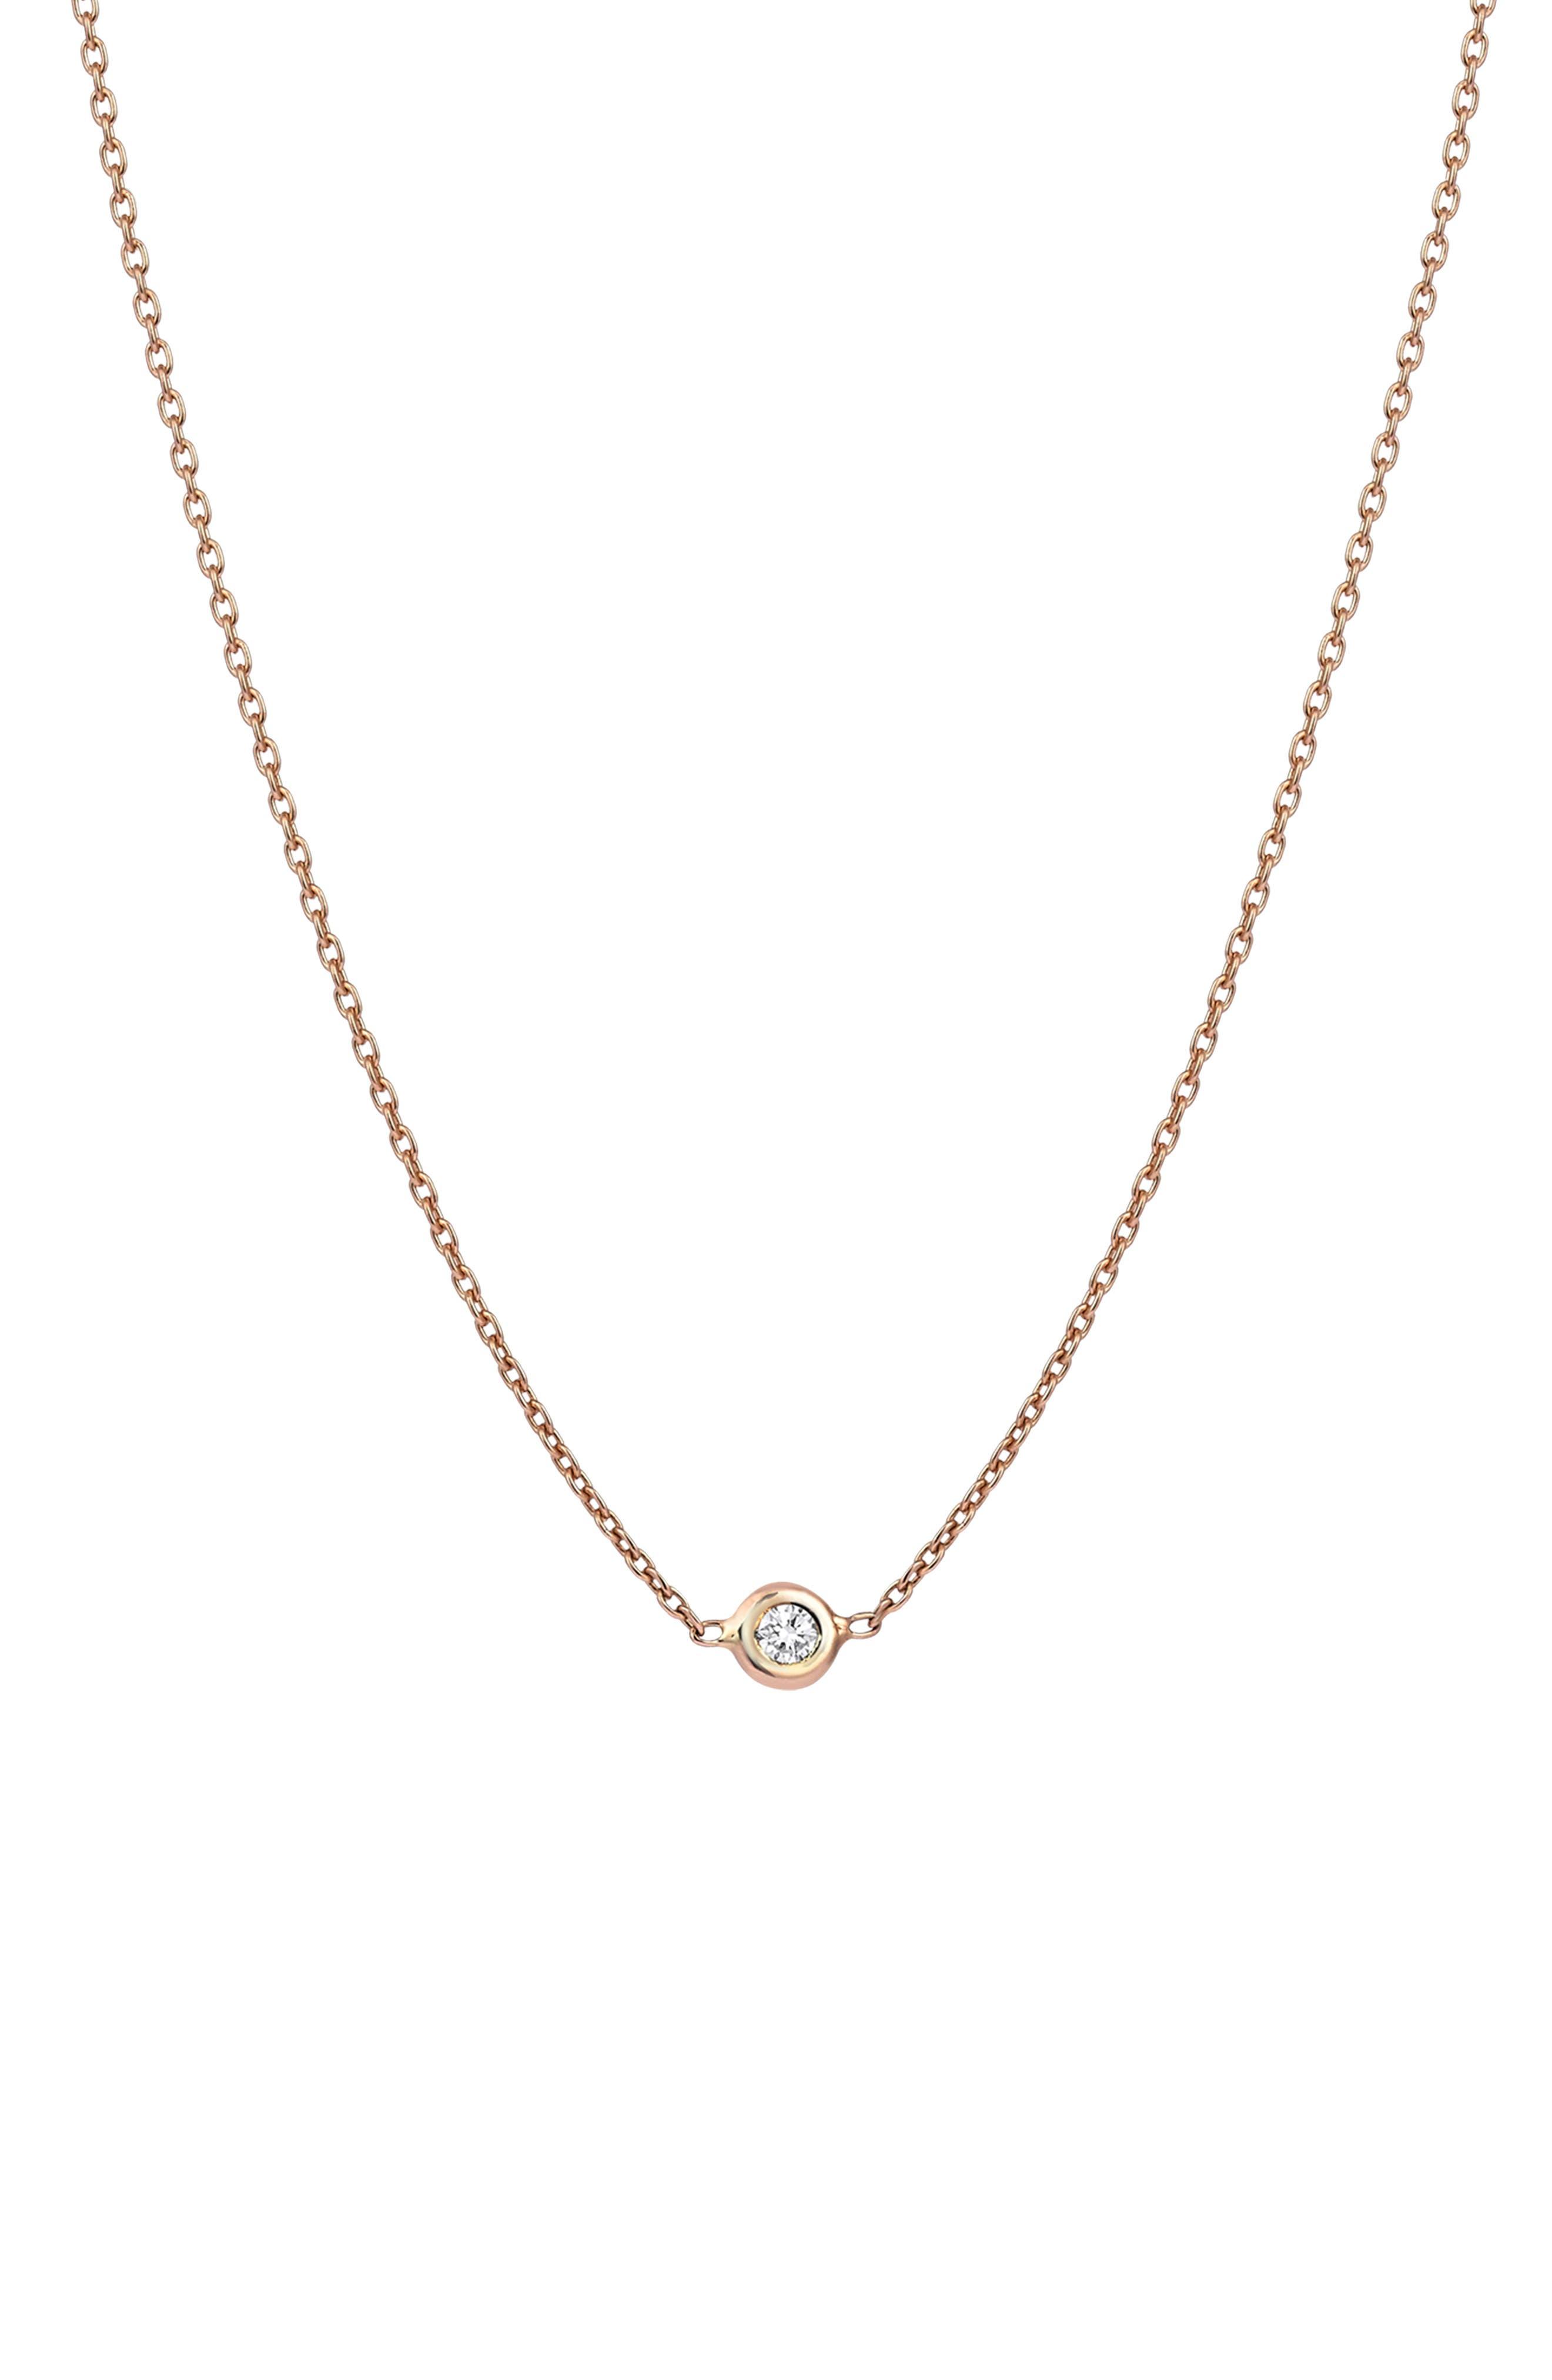 Diamond Choker Necklace,                             Main thumbnail 1, color,                             ROSE GOLD